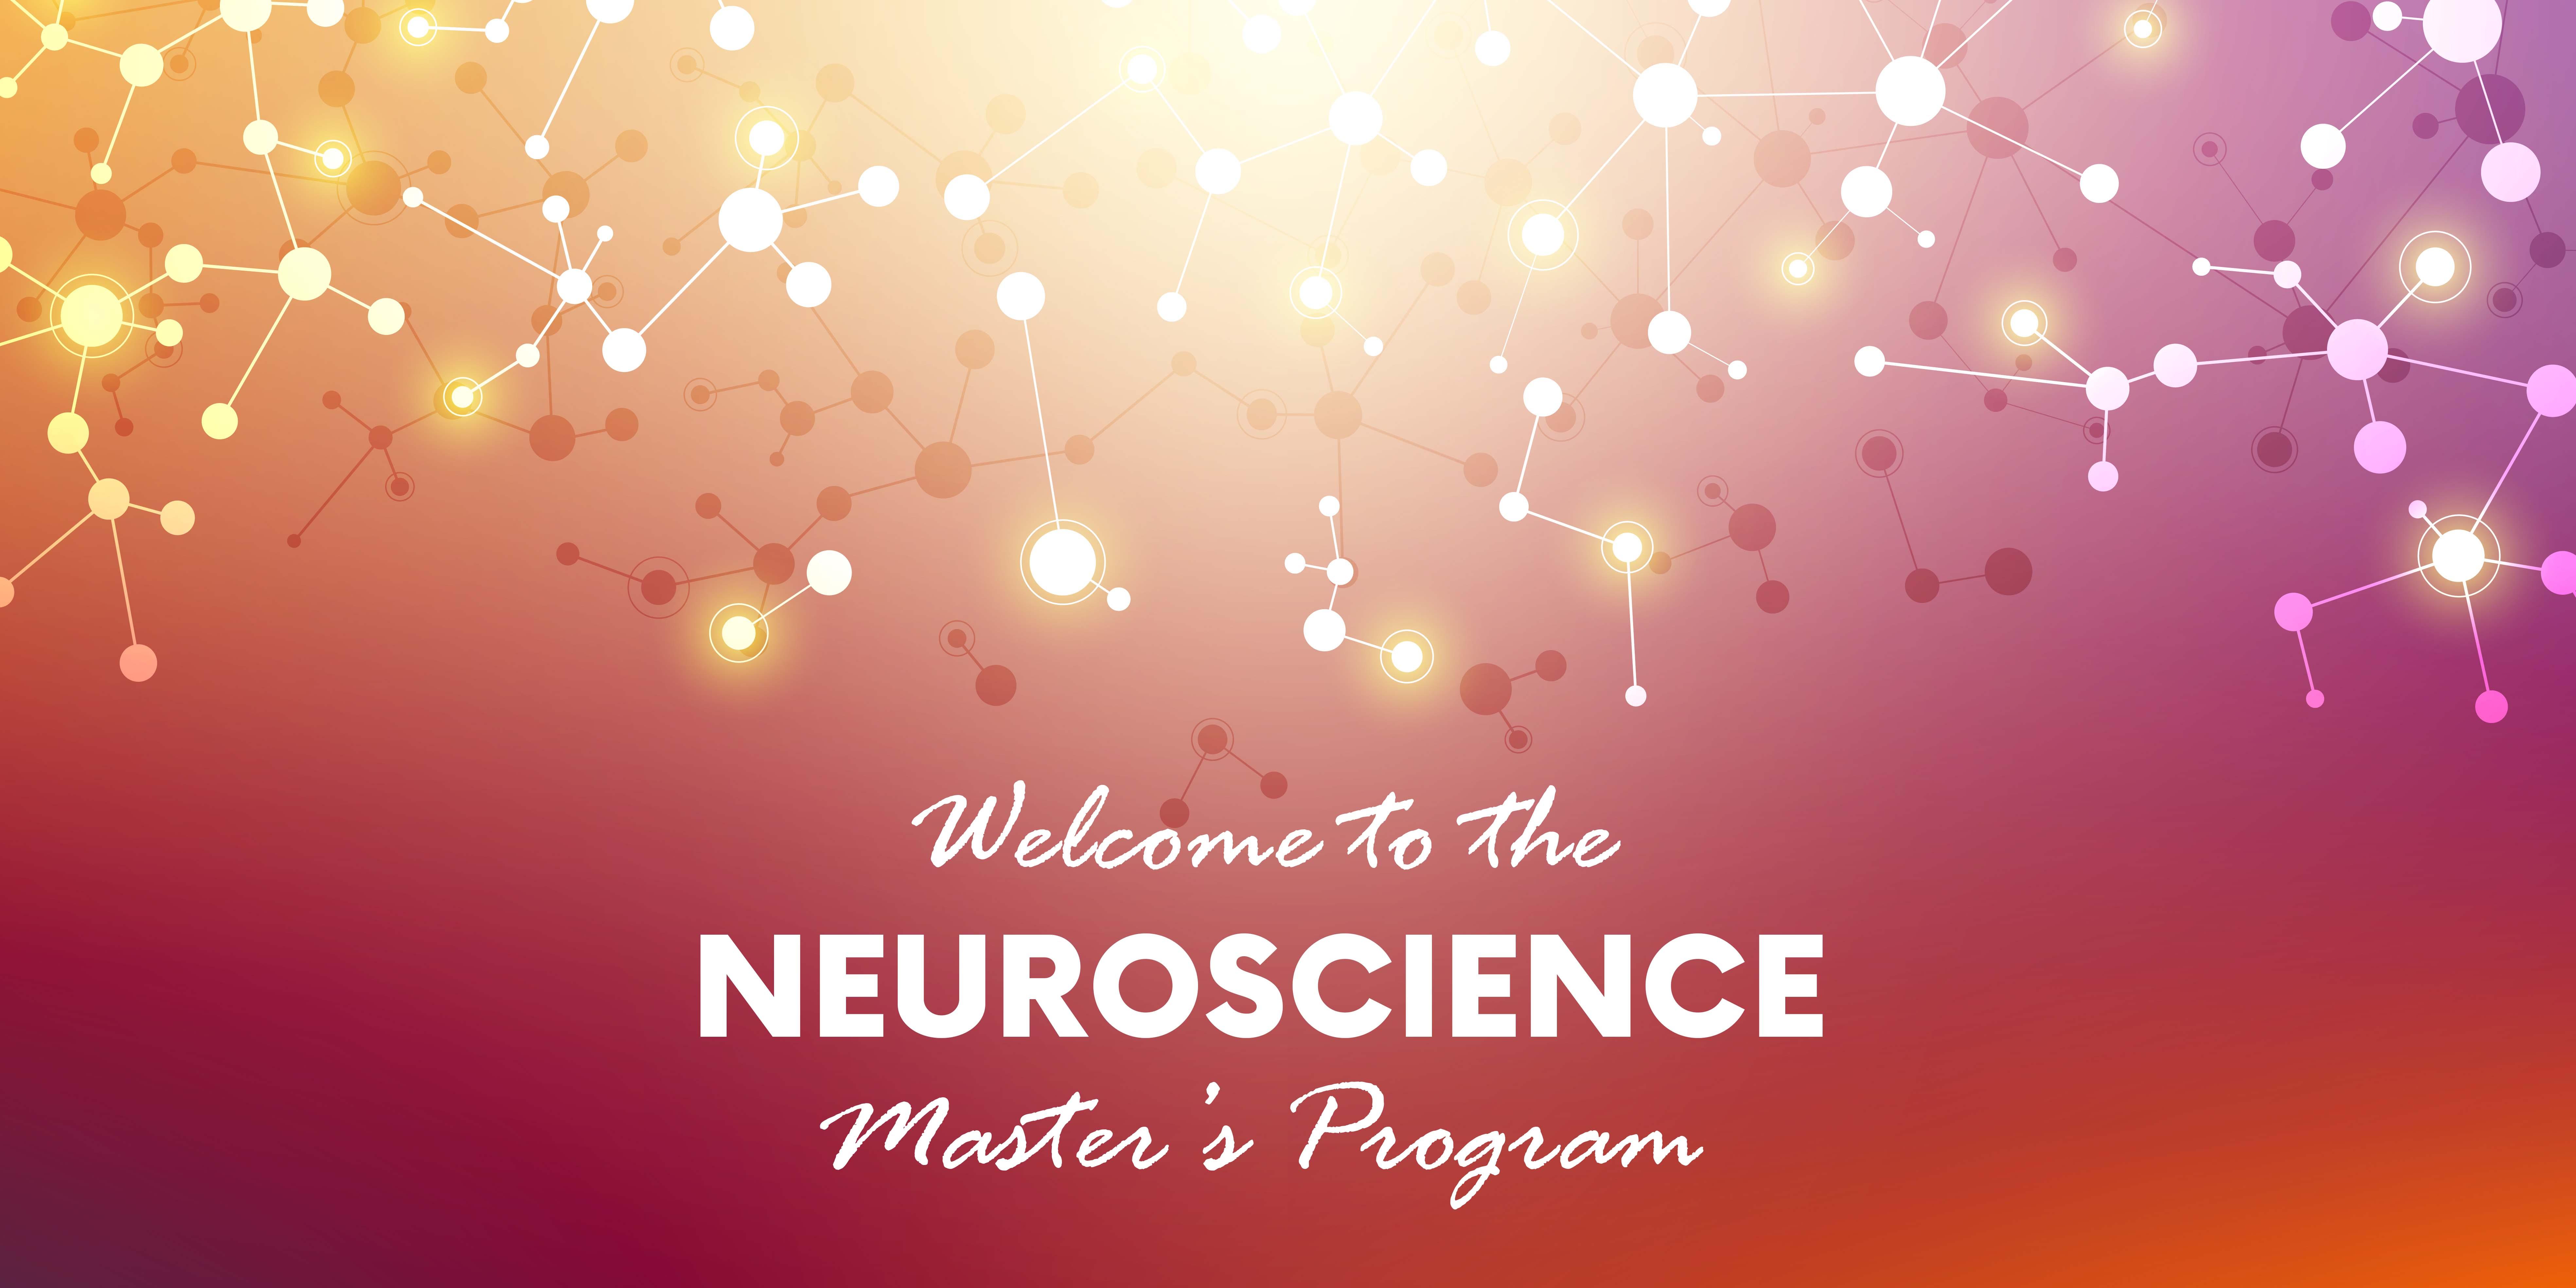 Master Neuroscience Paris | A new interdisciplinary